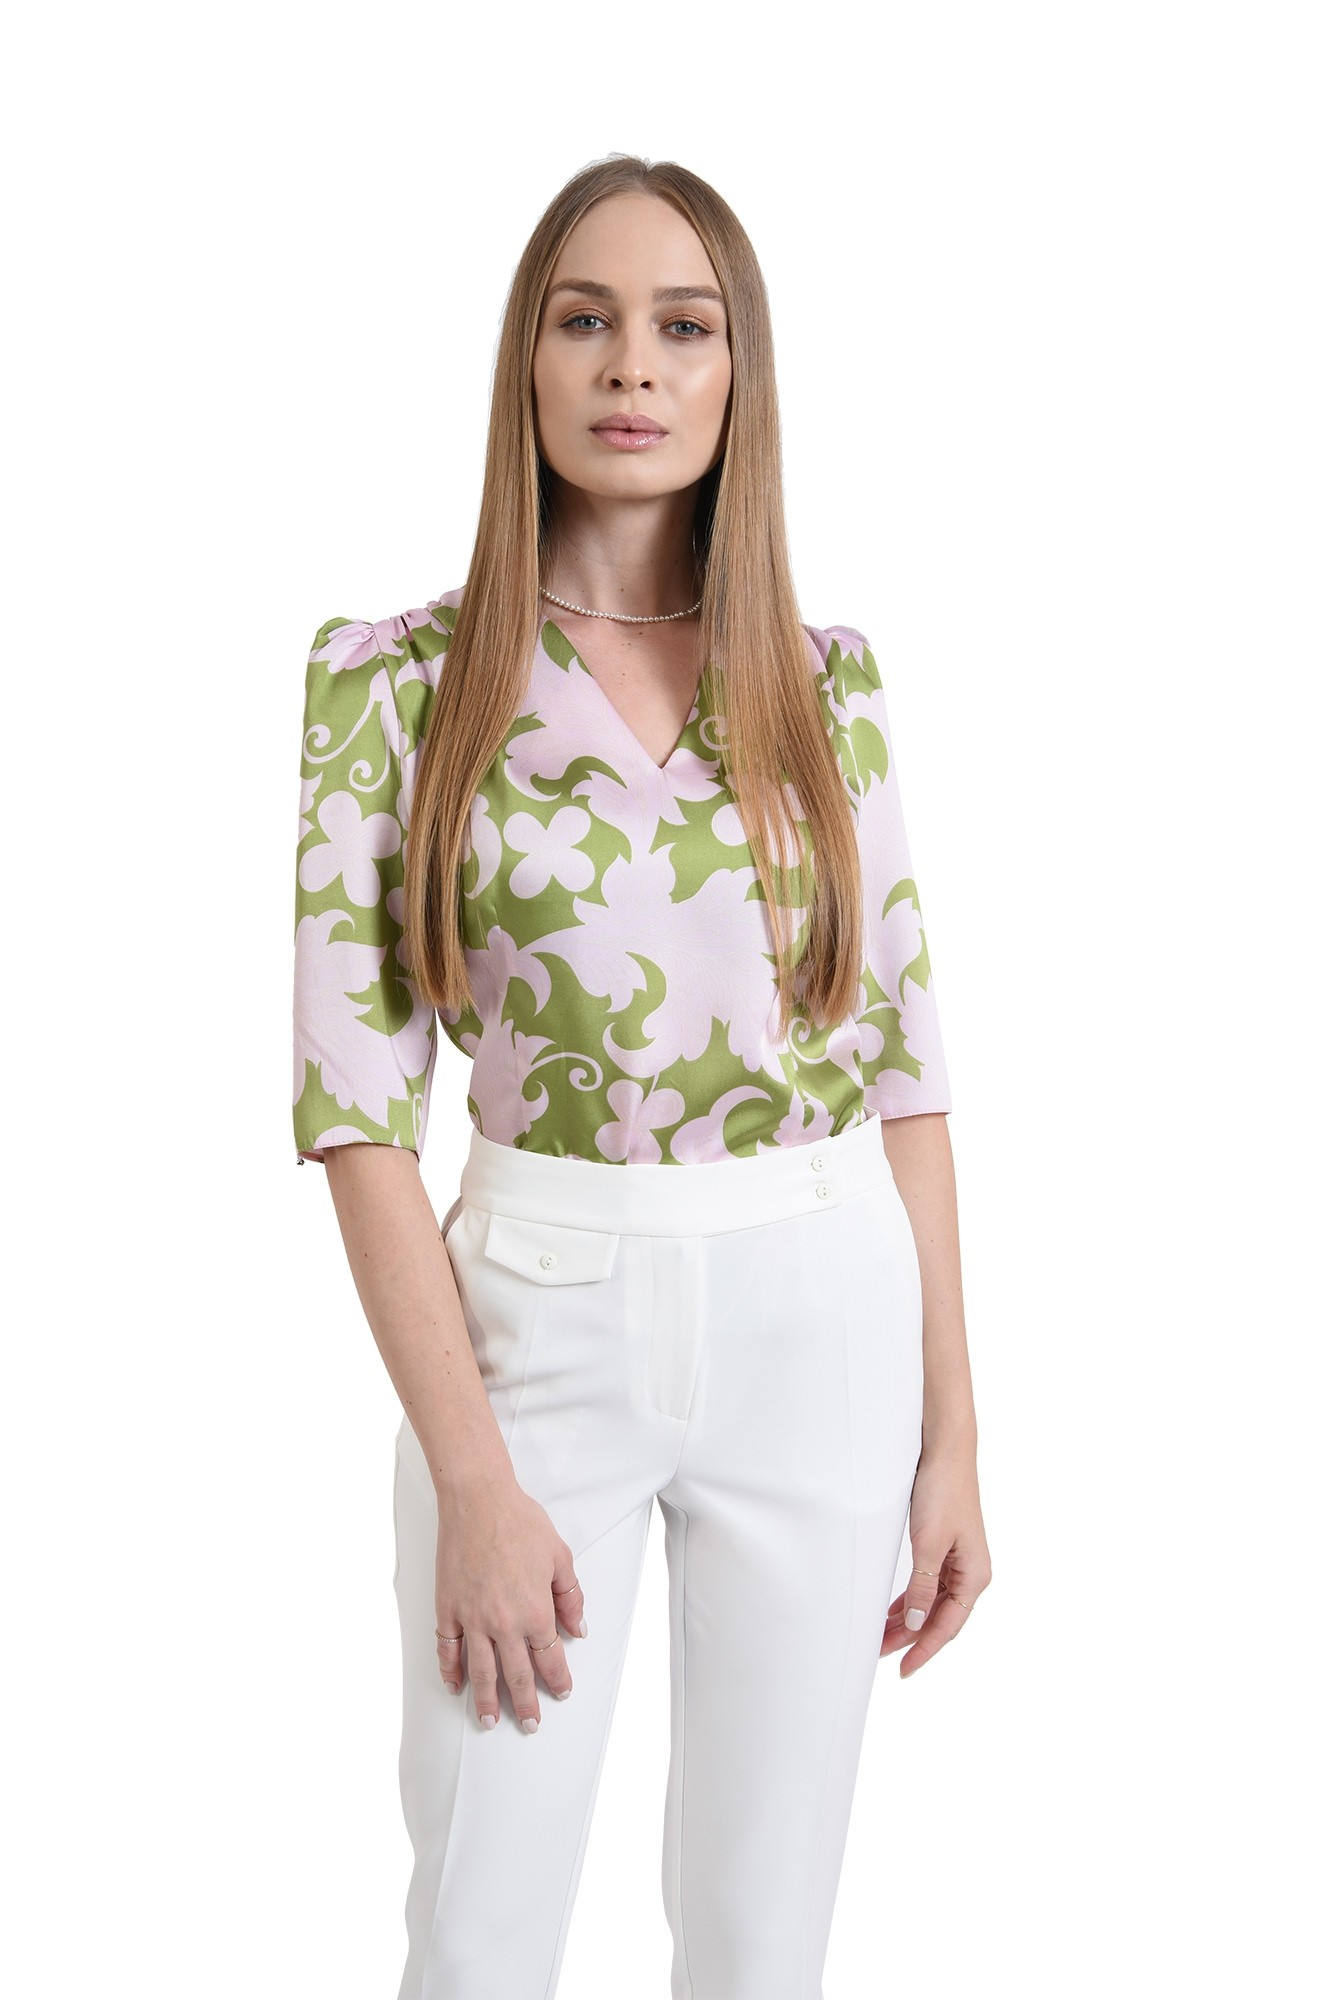 3 - bluza din satin, cu motive florale